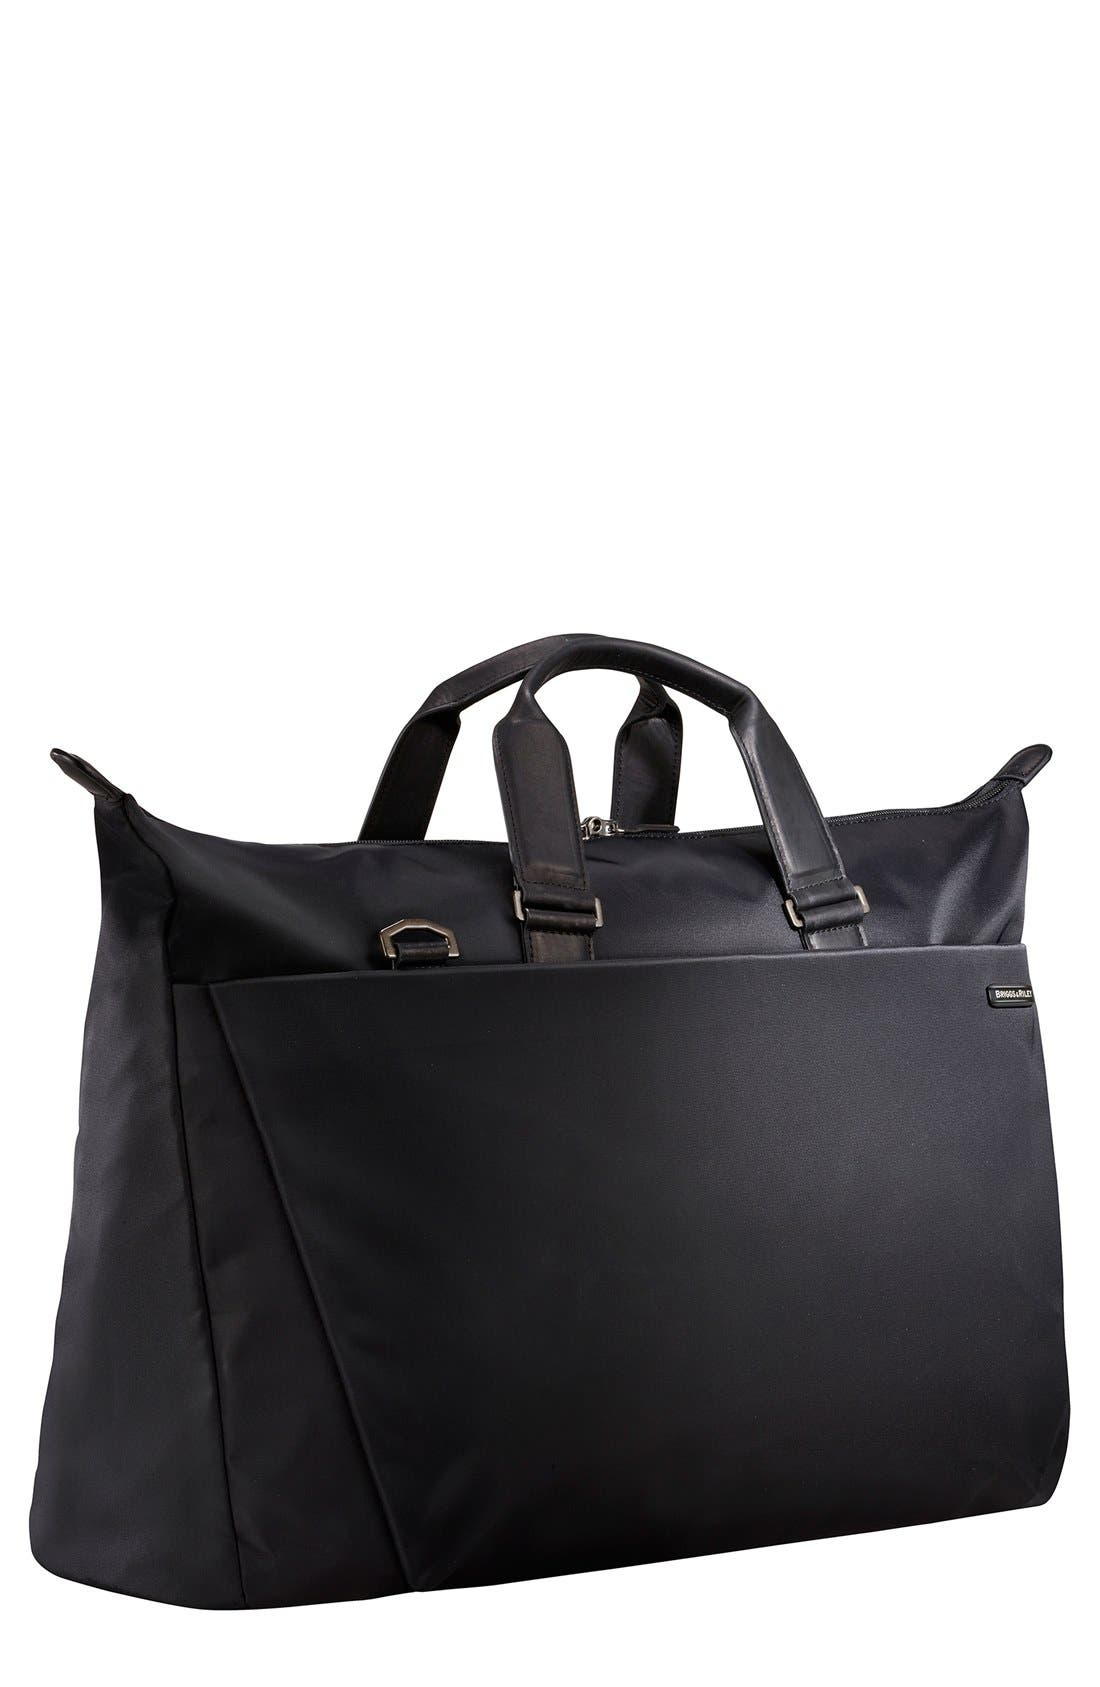 Sympatico 22-Inch Duffel Bag,                             Main thumbnail 1, color,